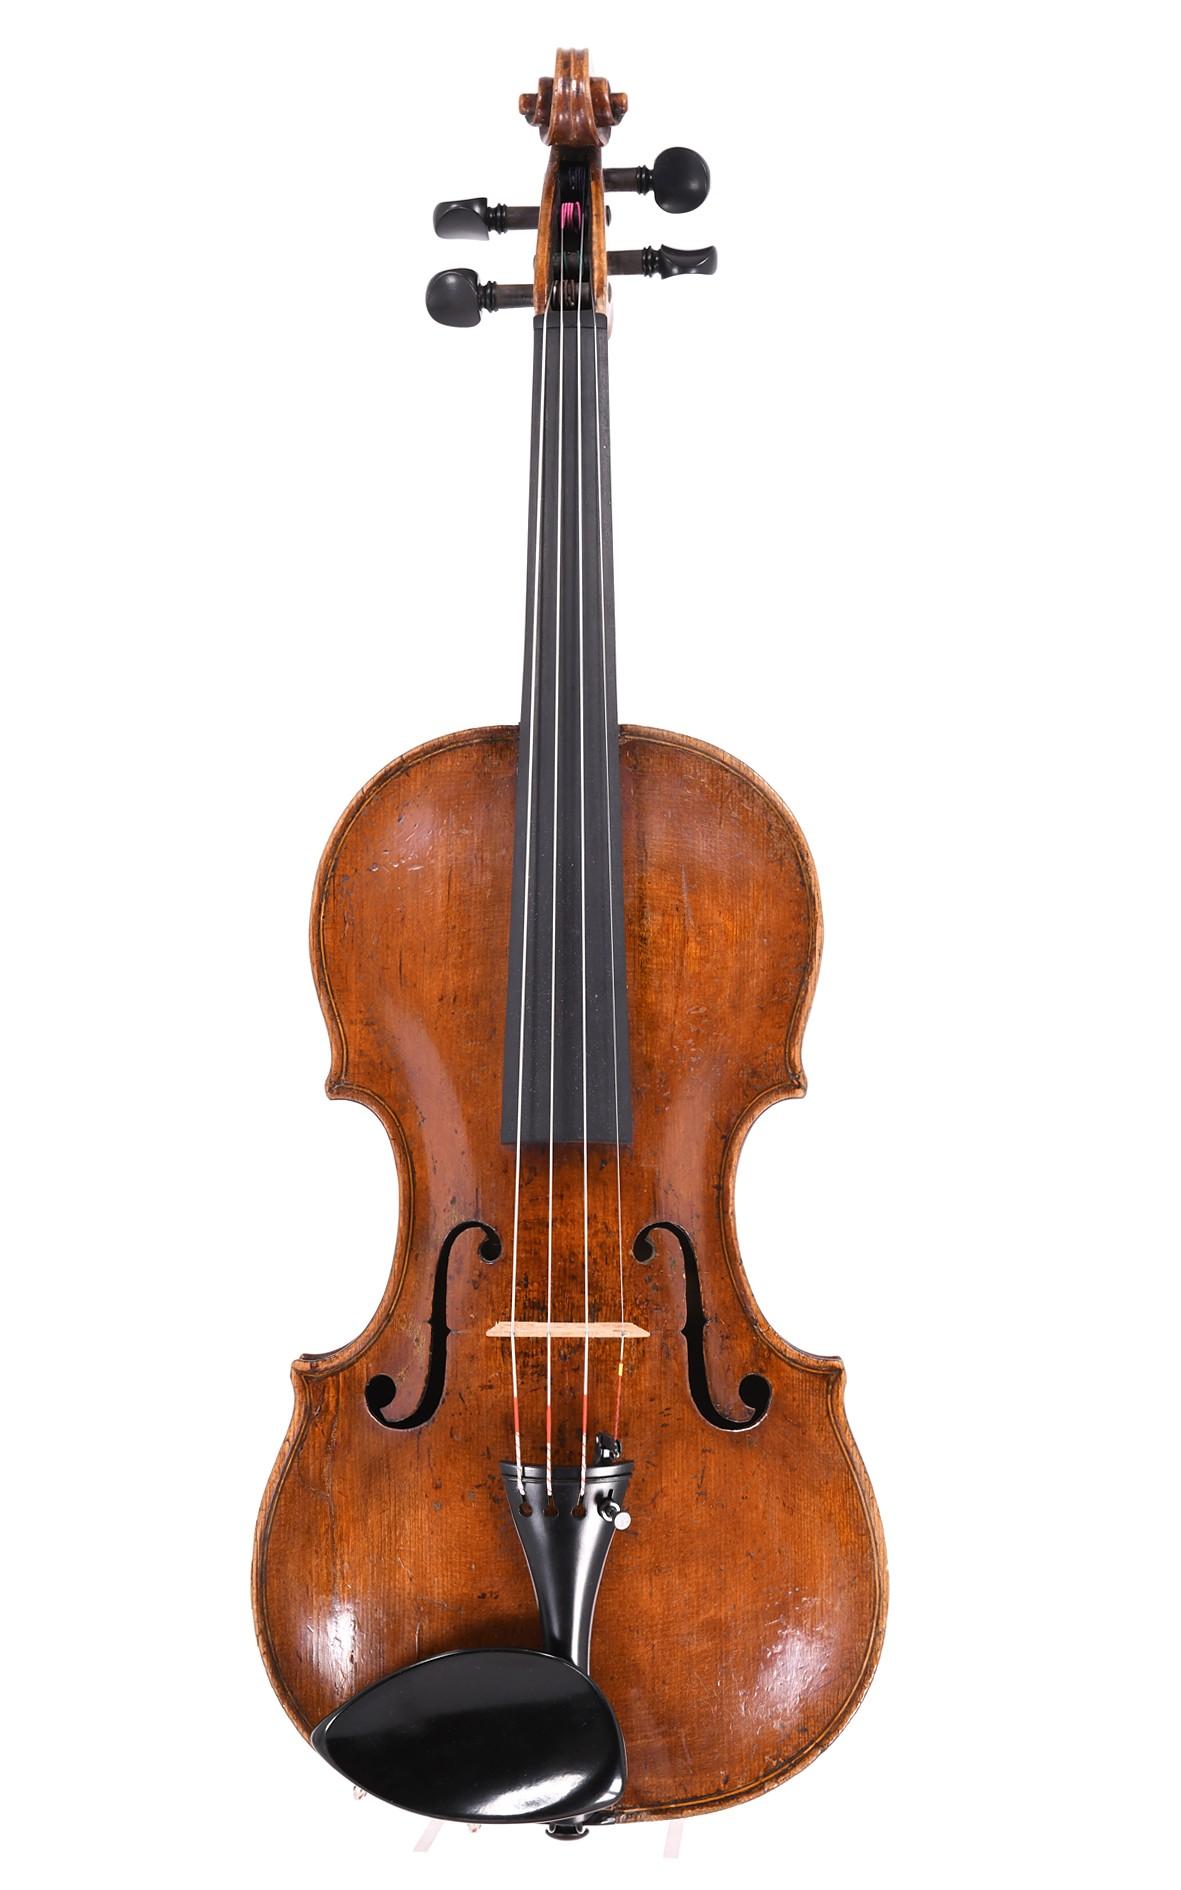 Rare English violin by John Crowther, Holburn, London, 1788